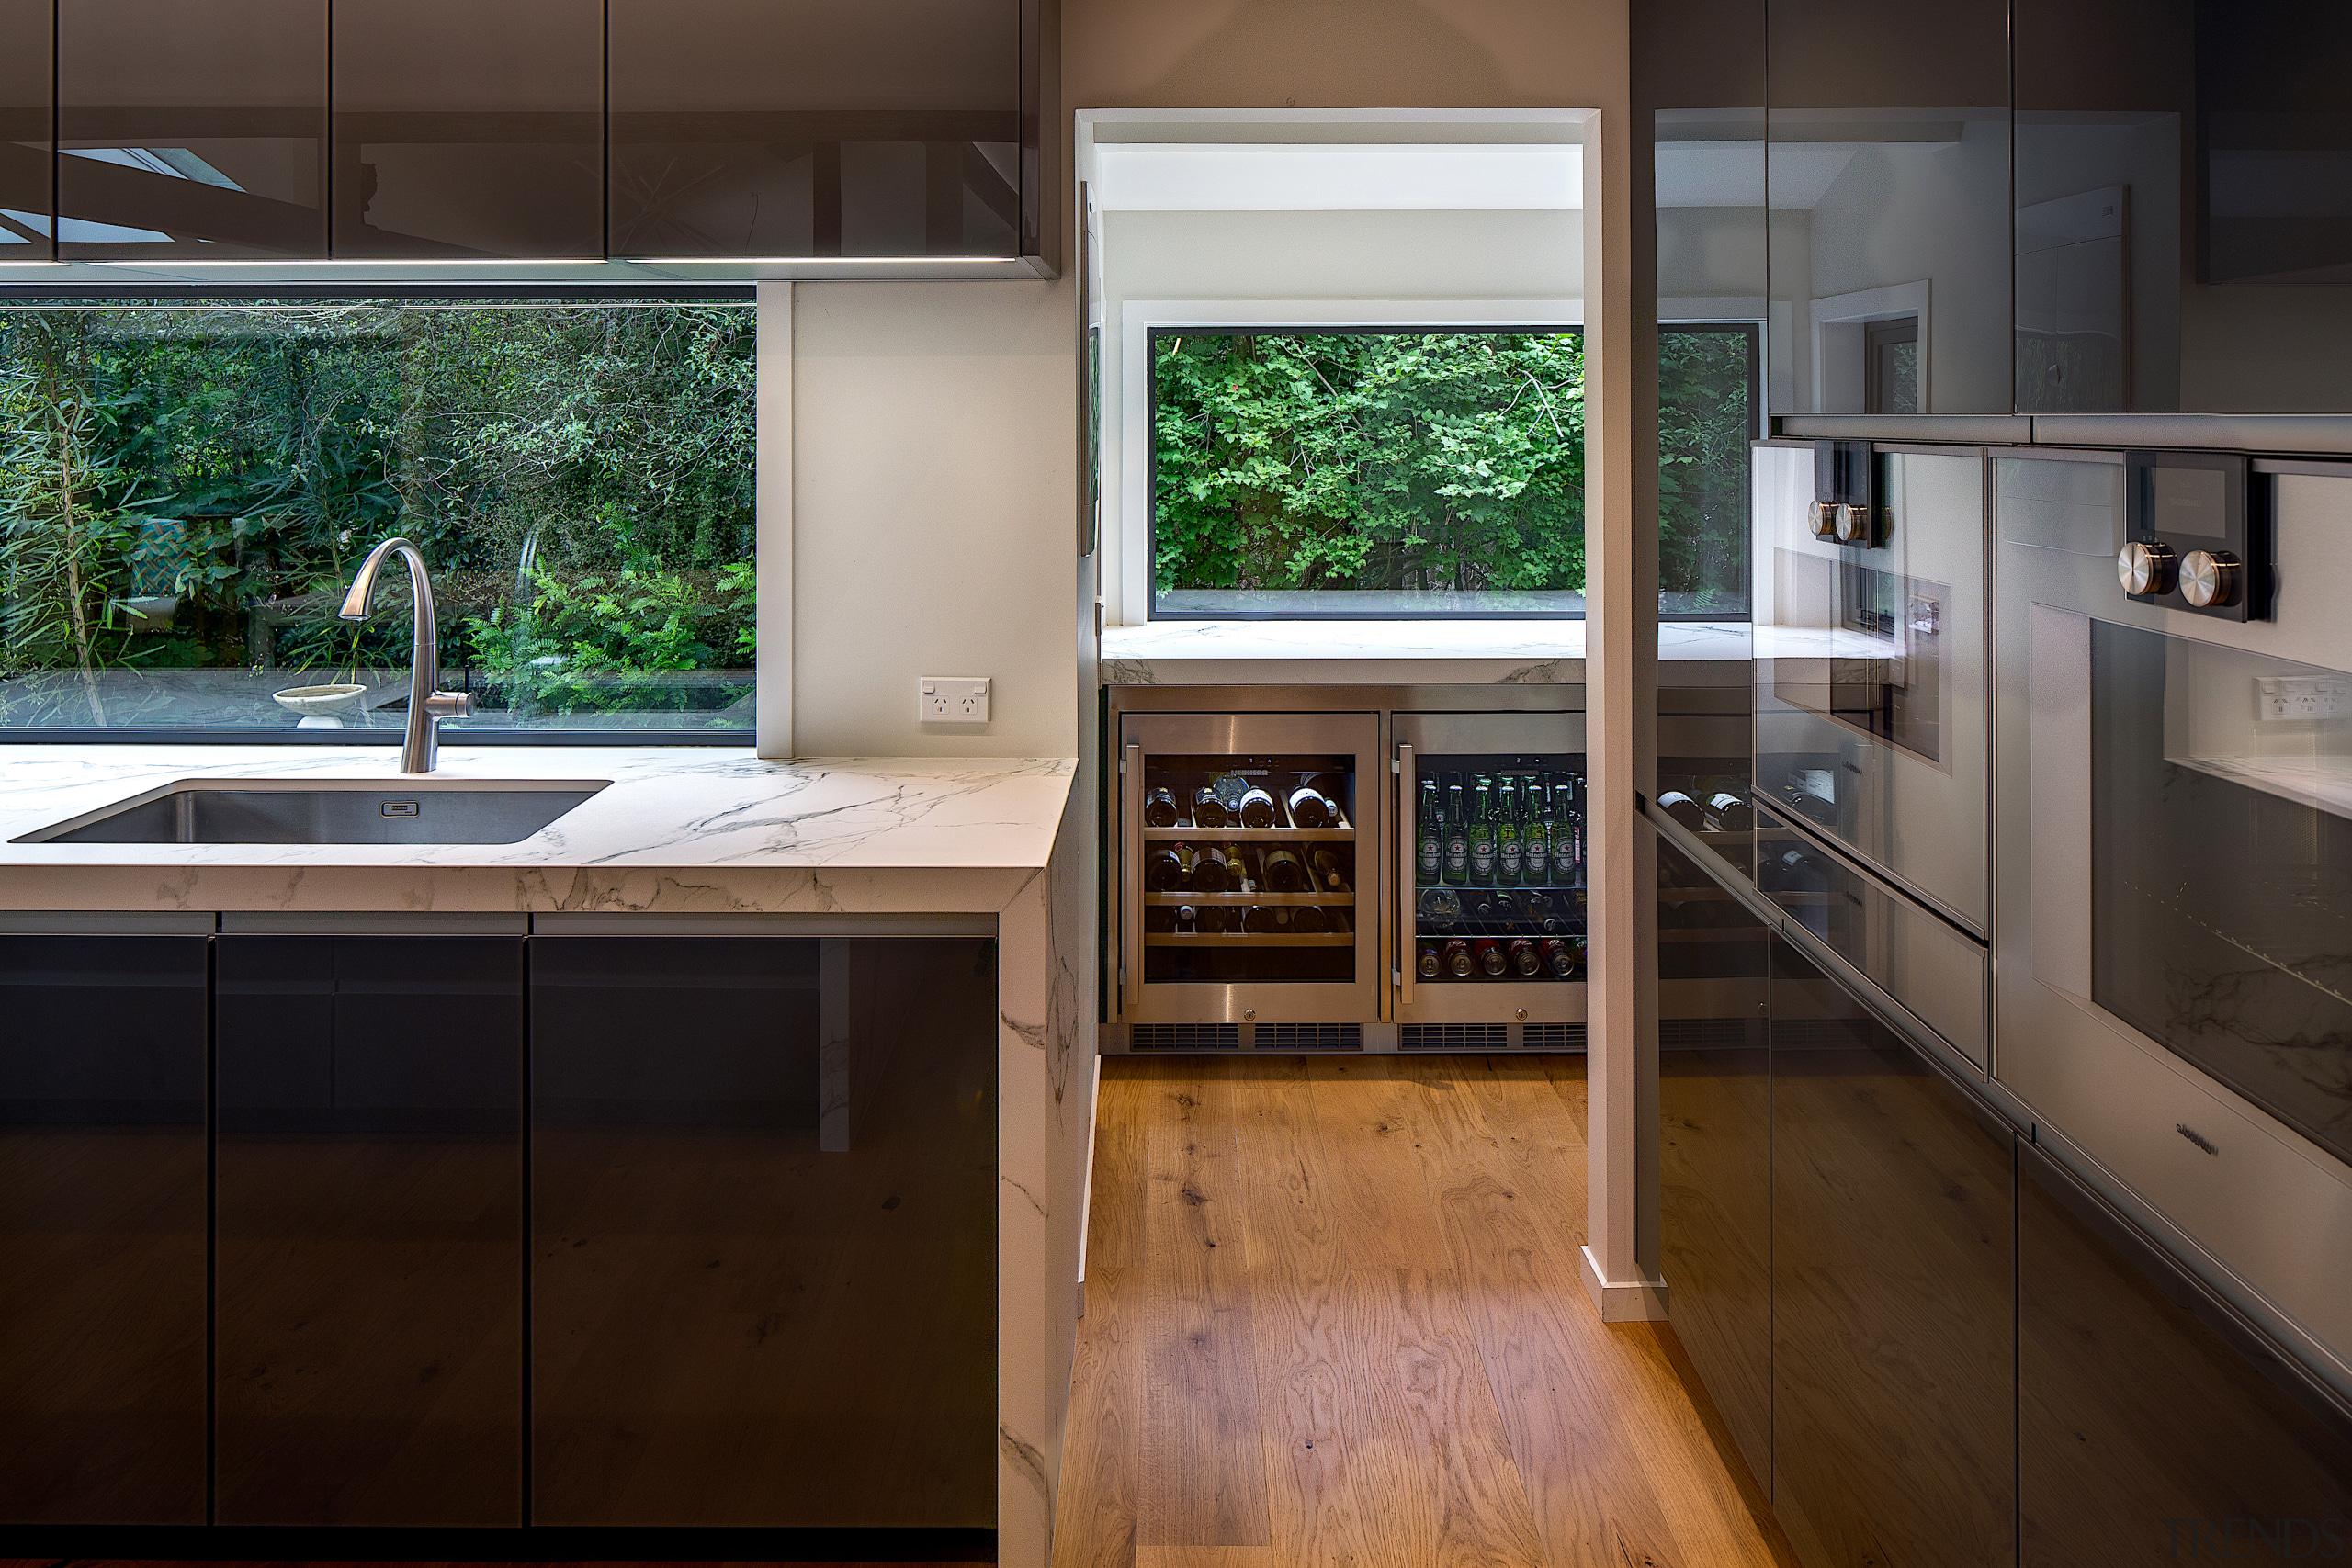 Always nice that the wine fridge is near